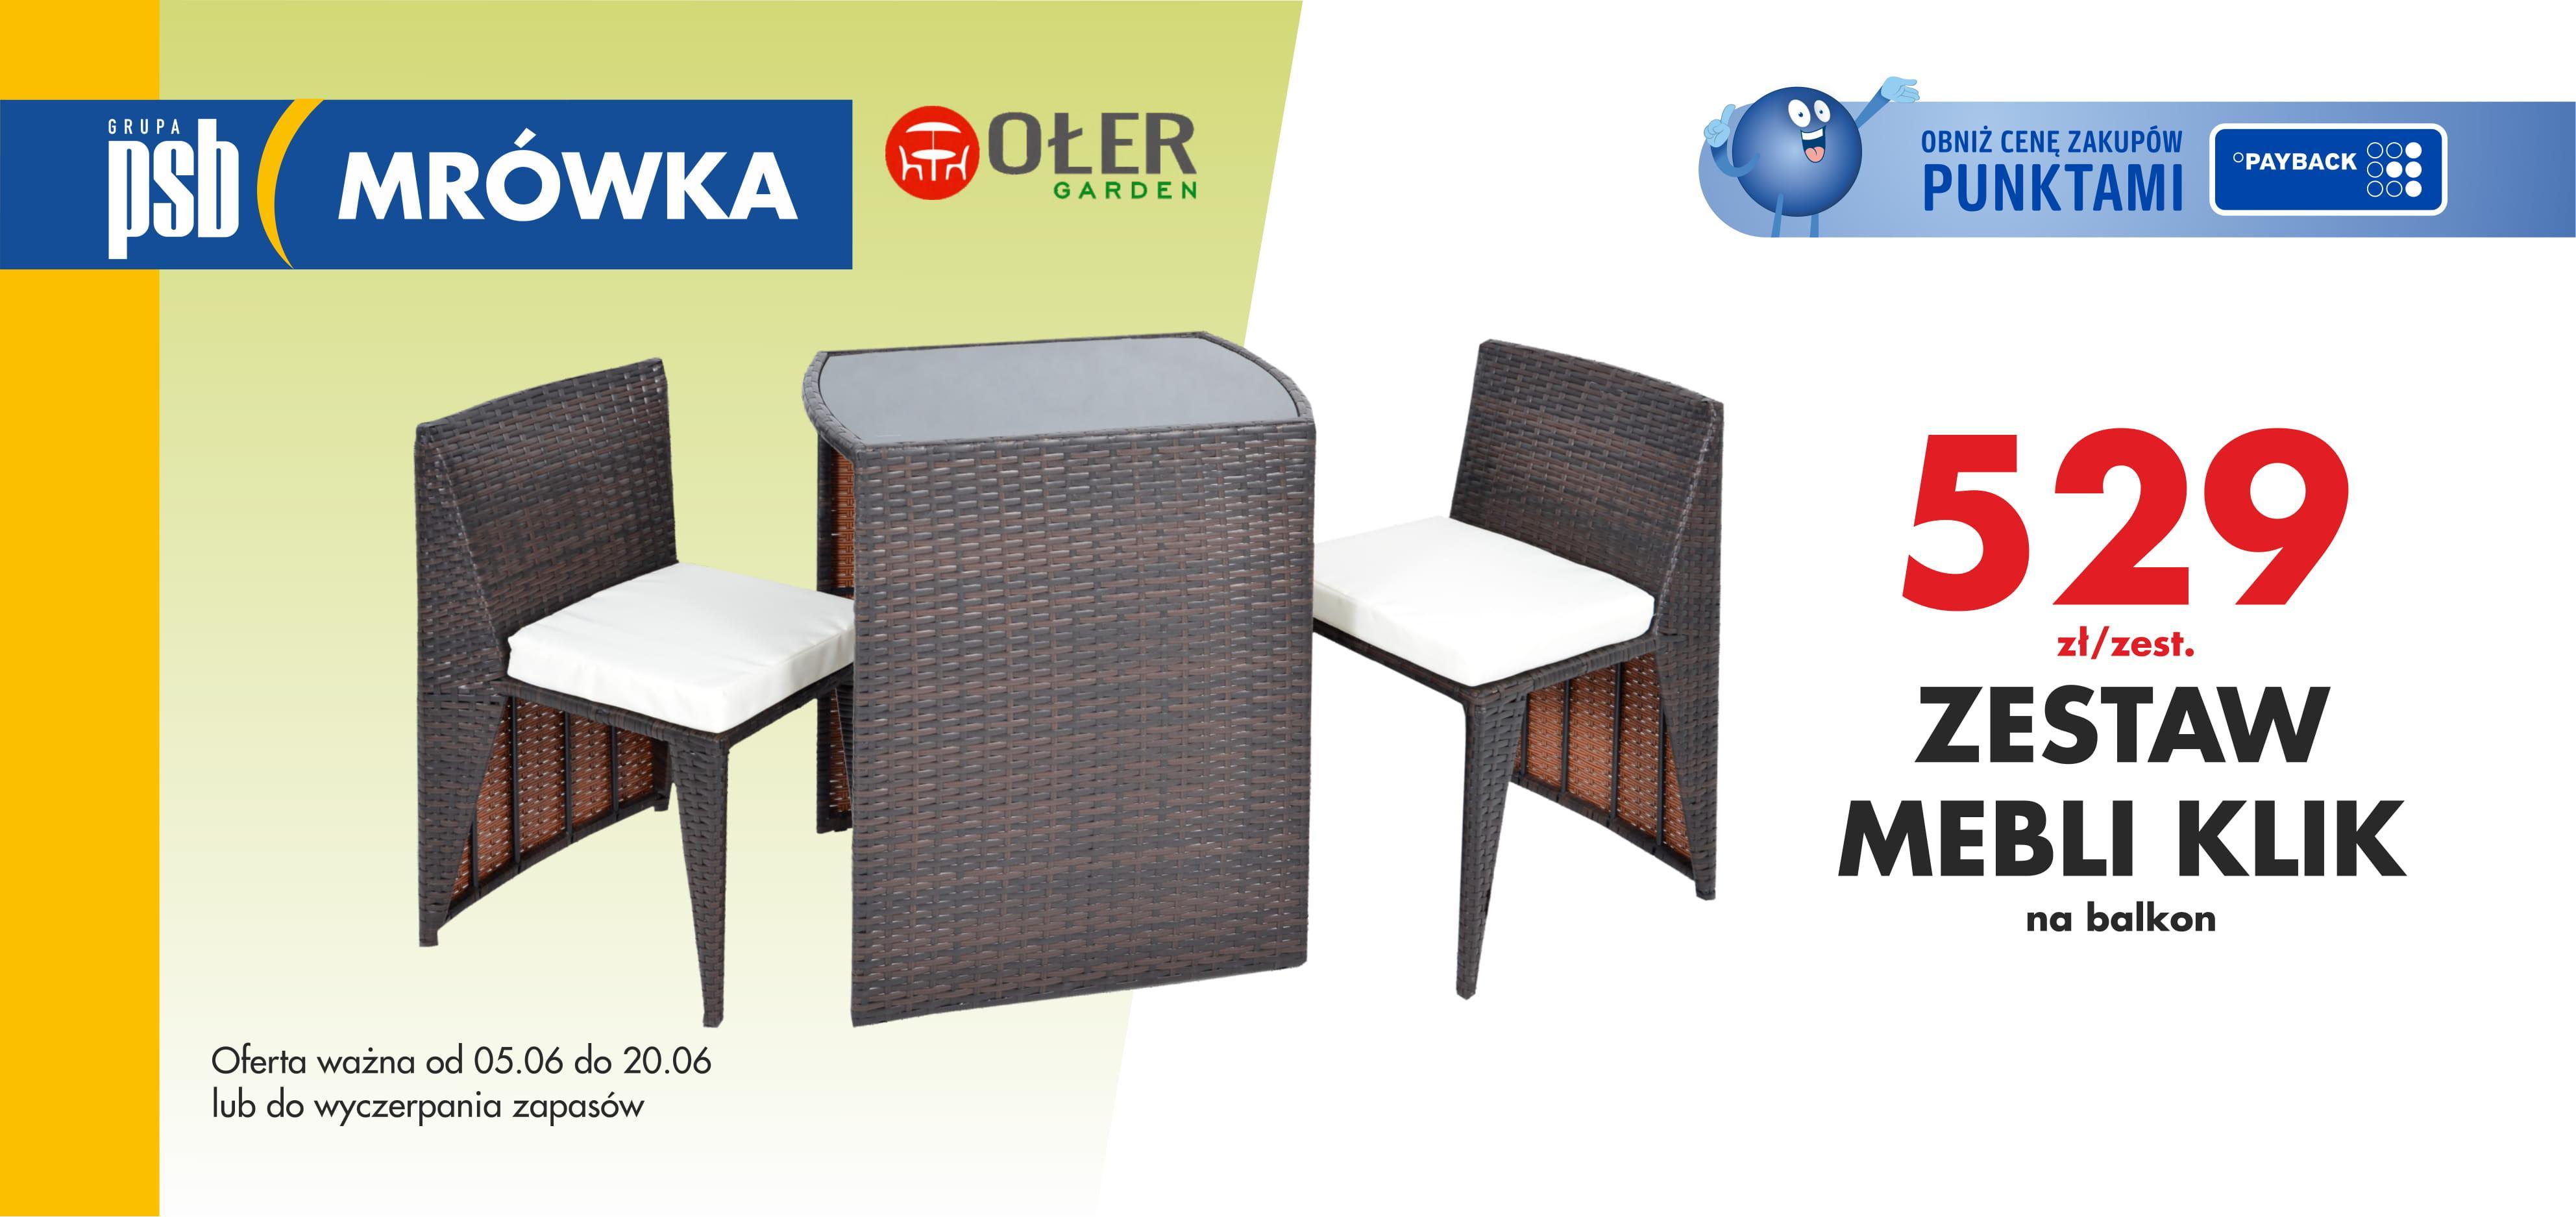 Zestaw-mebli-Klik-504x238-1